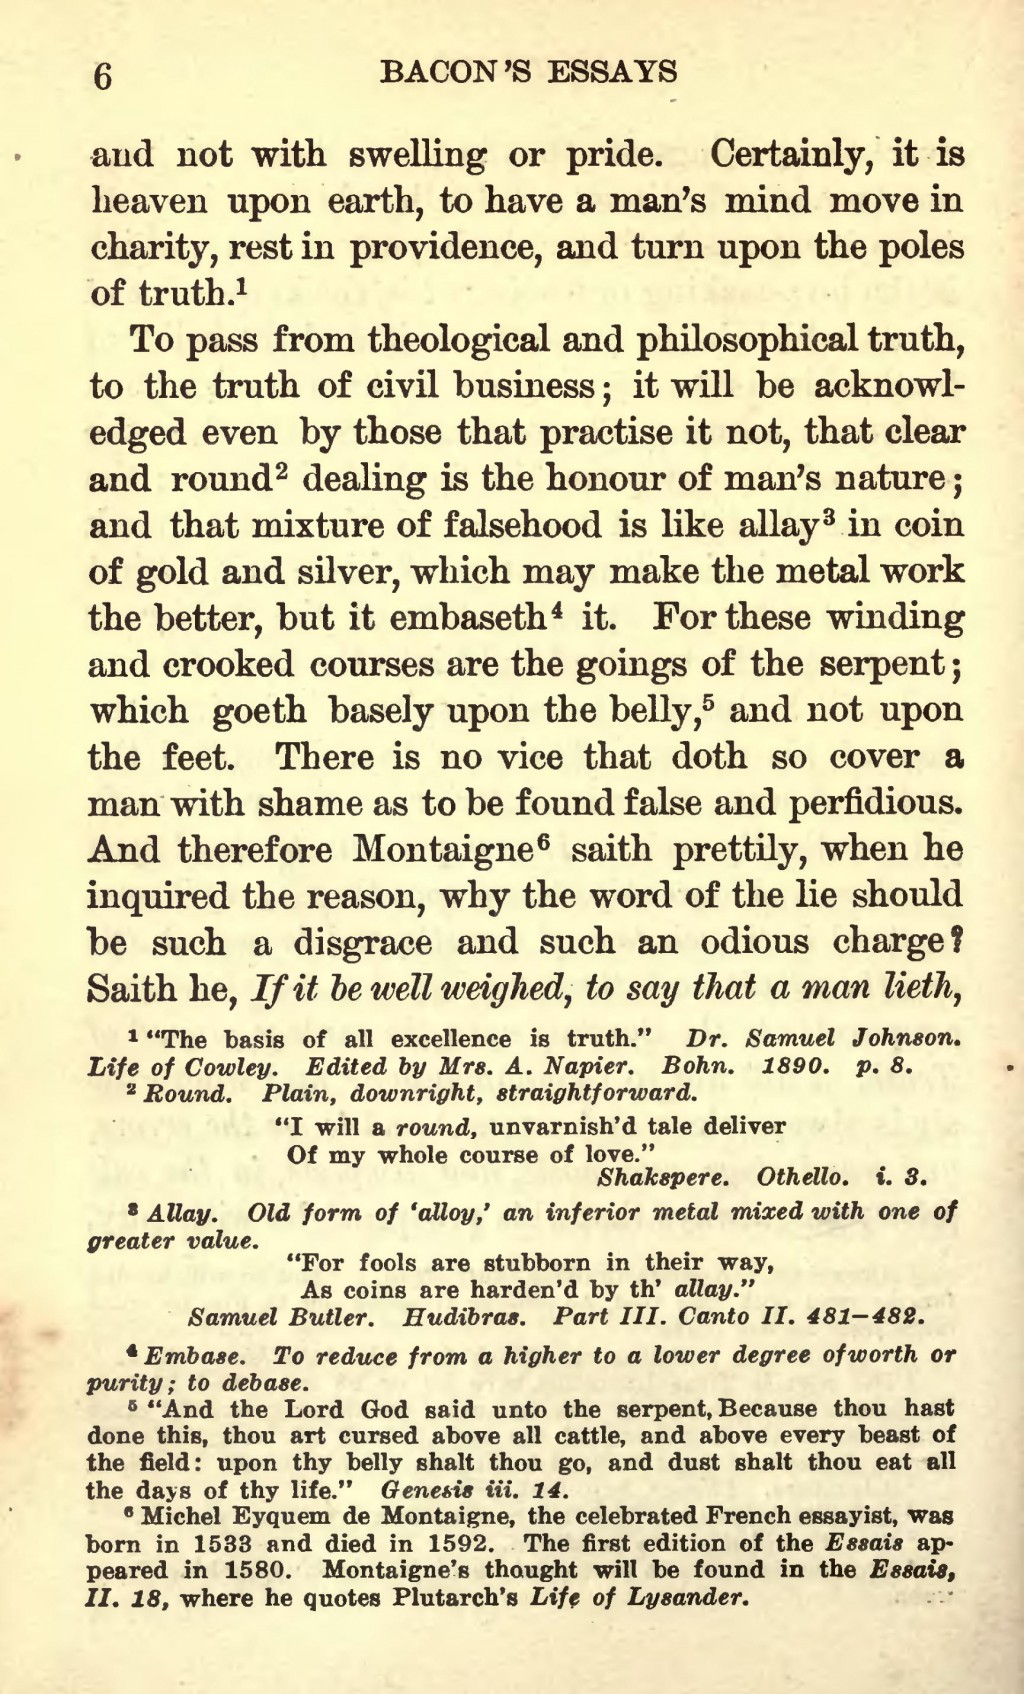 009 Page116 1728px Of Francis Bacon 1908 Scott Djvu Essay Example Bacons Amazing Essays In Urdu Pdf Truth Summary Large